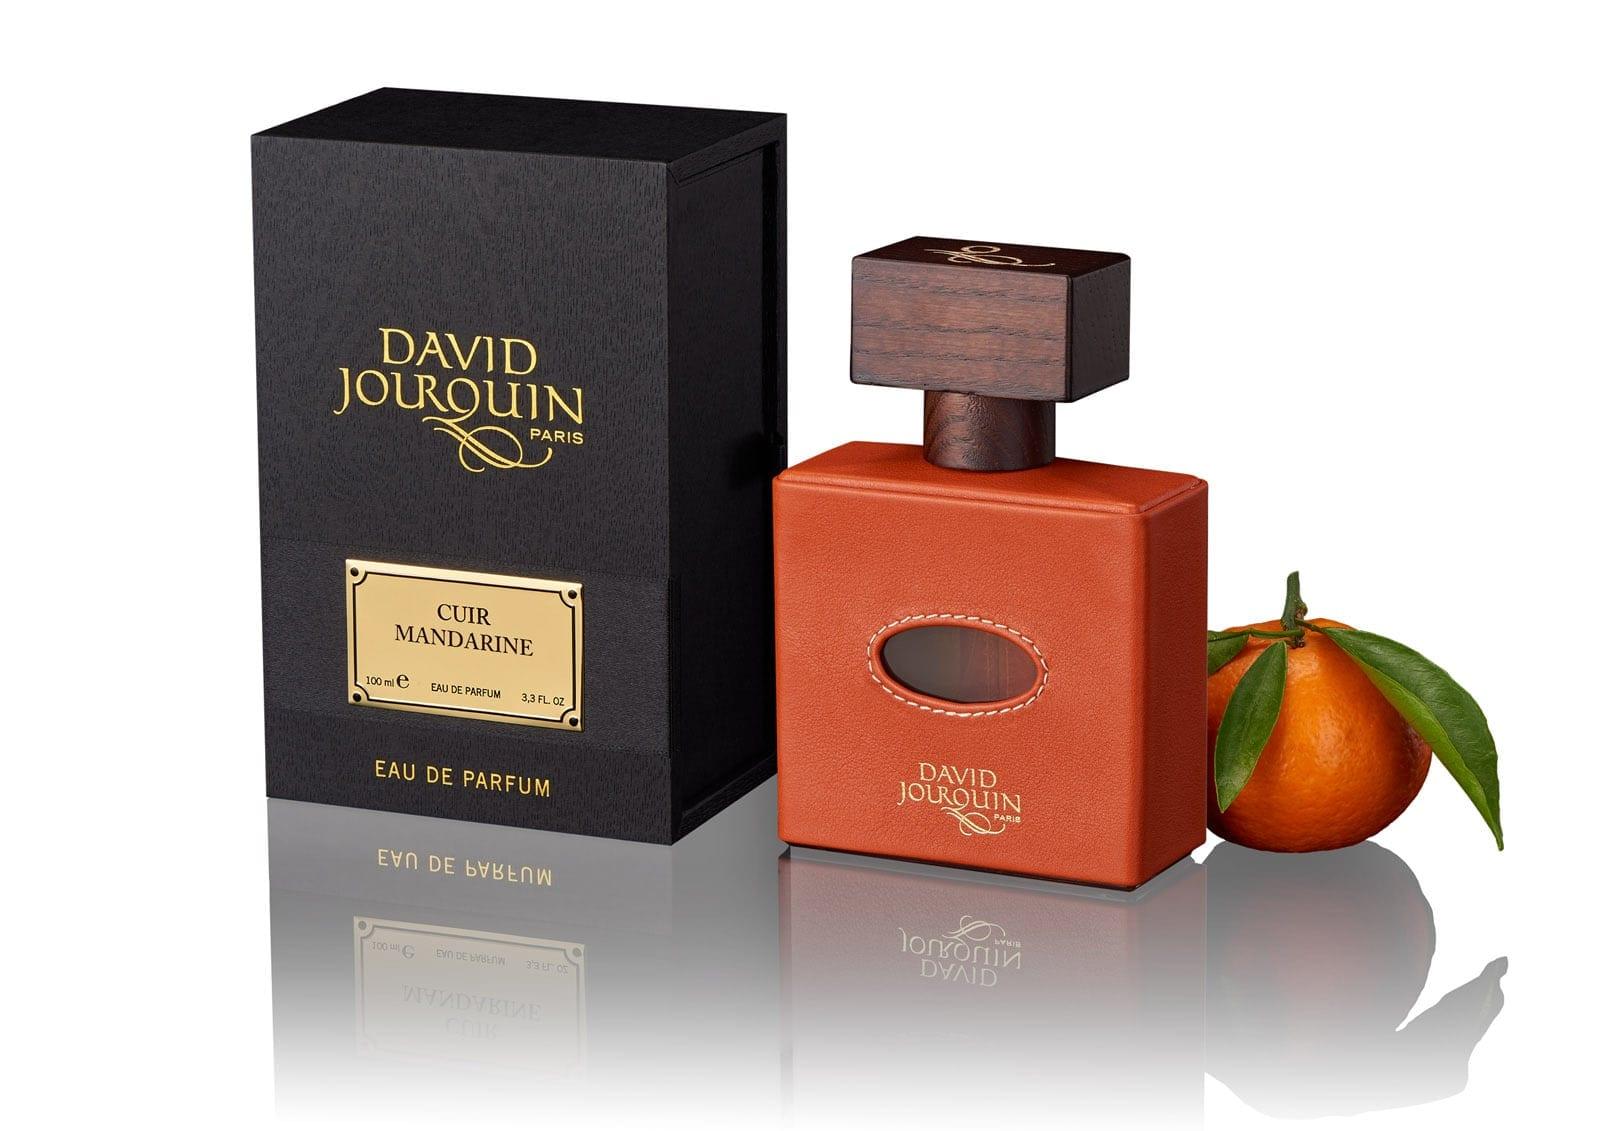 DAVID JOURQUIN – CUIR MANDARINE. Cuir-Mandarine